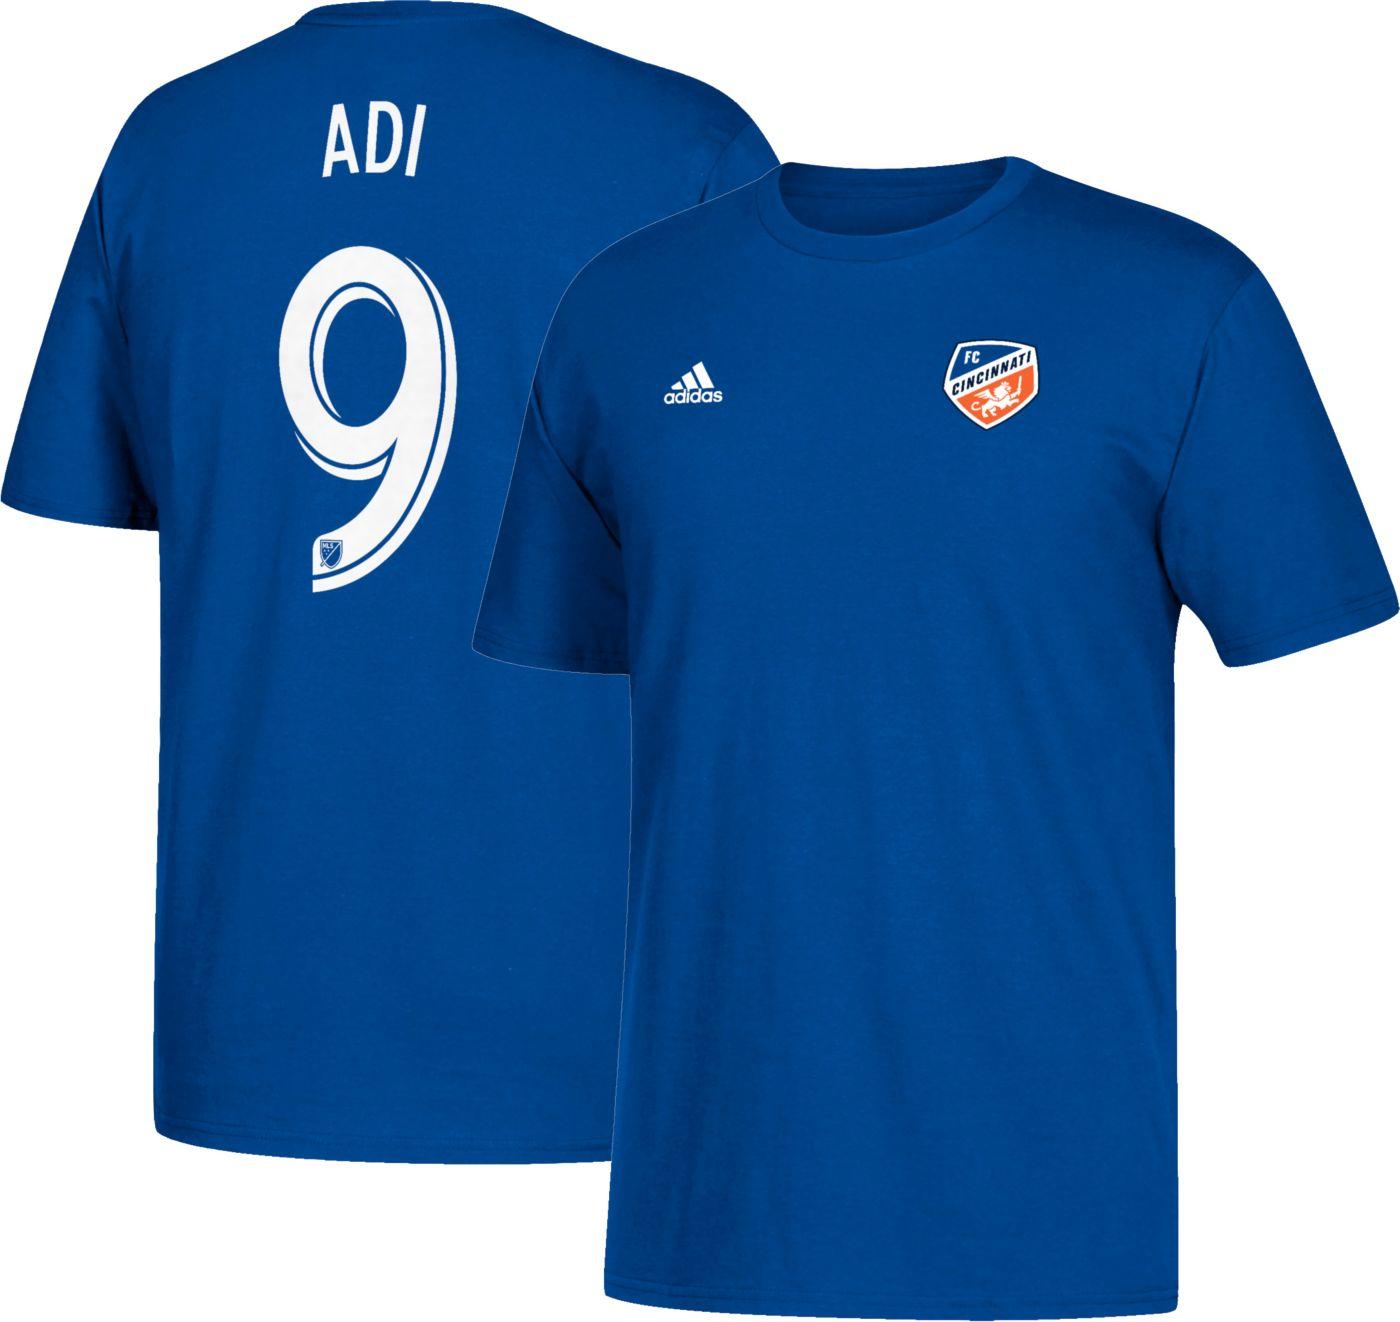 adidas Men's FC Cincinnati Fanendo Adi #9 Blue Player T-Shirt